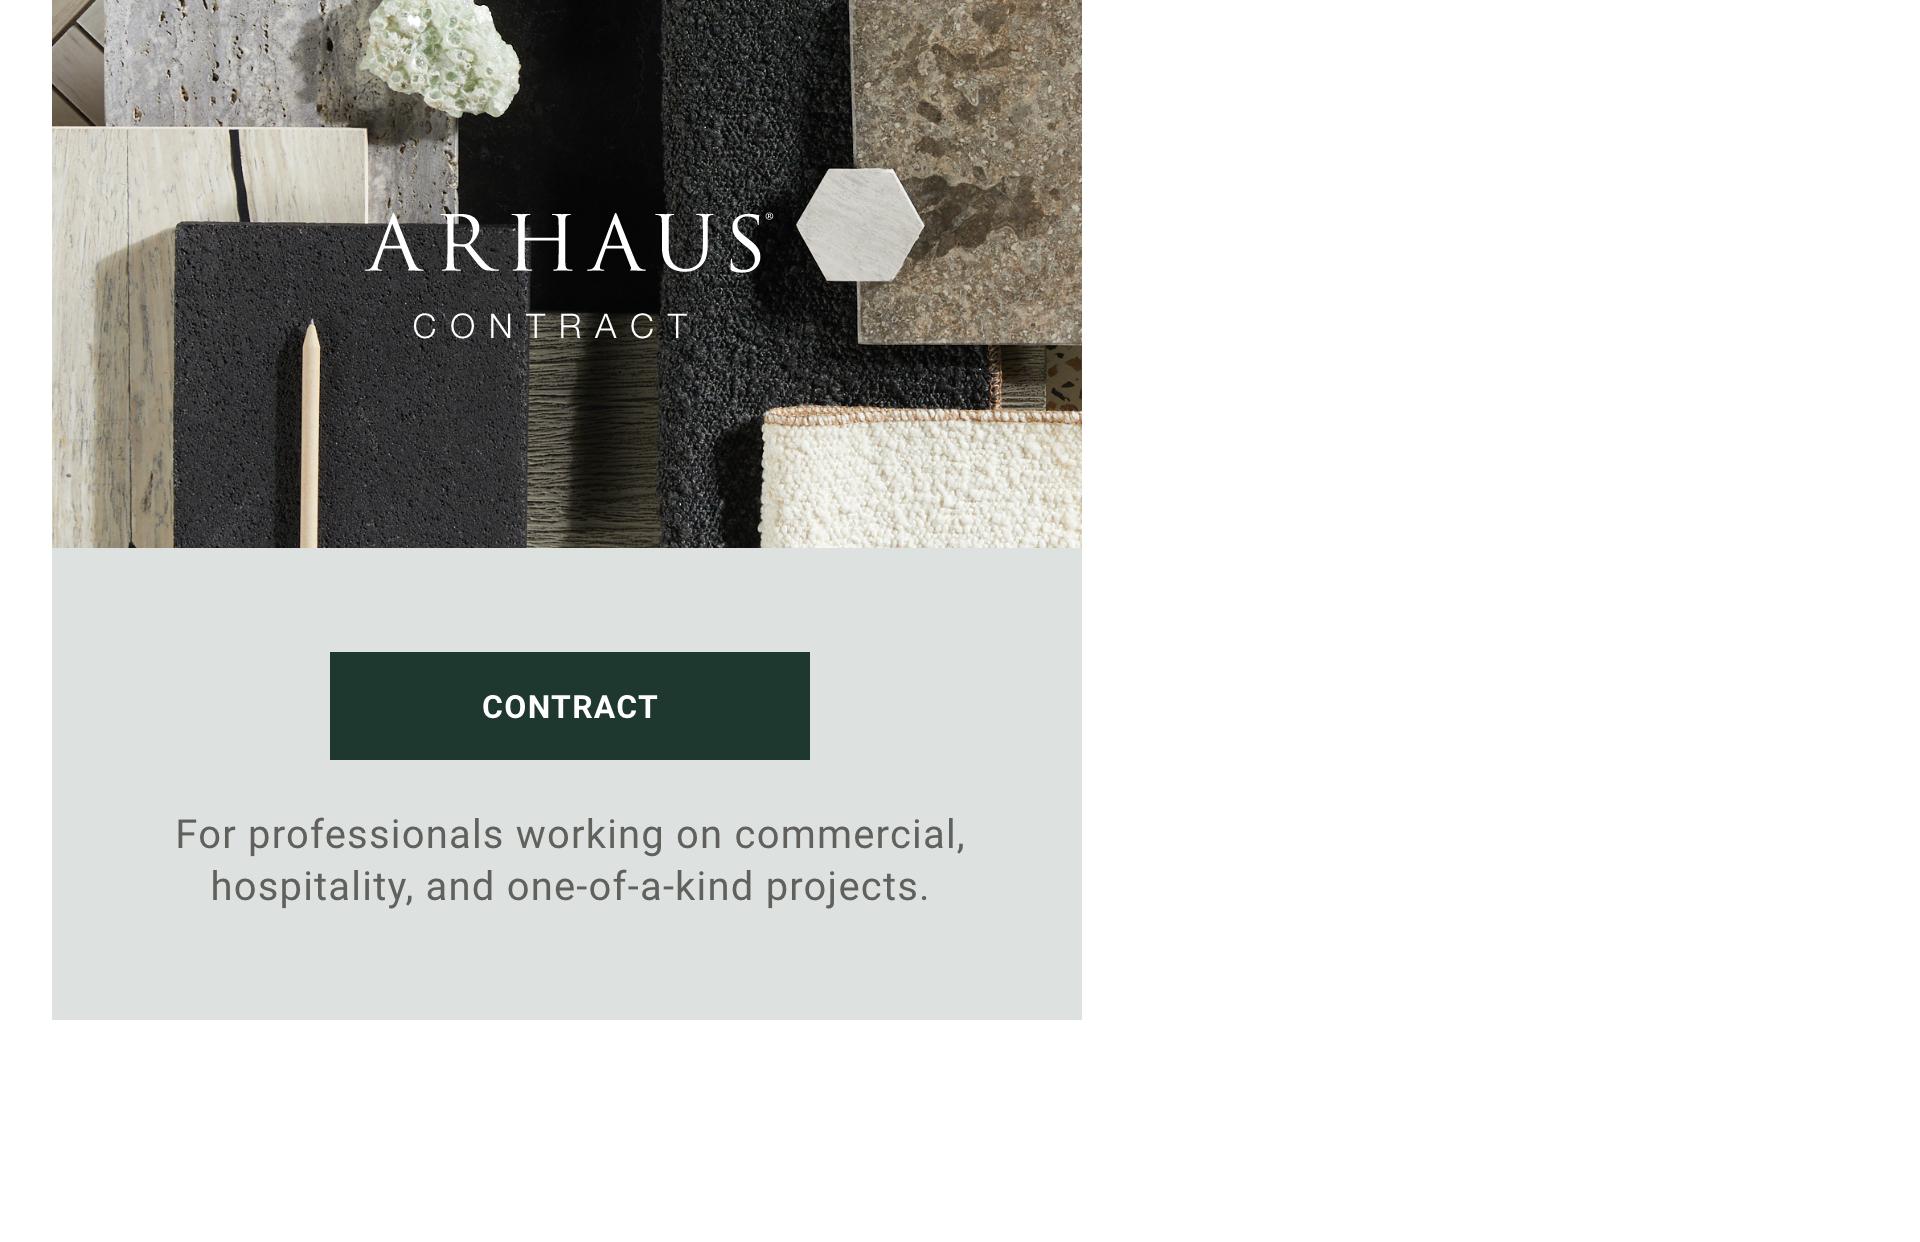 Arhaus Contract Program